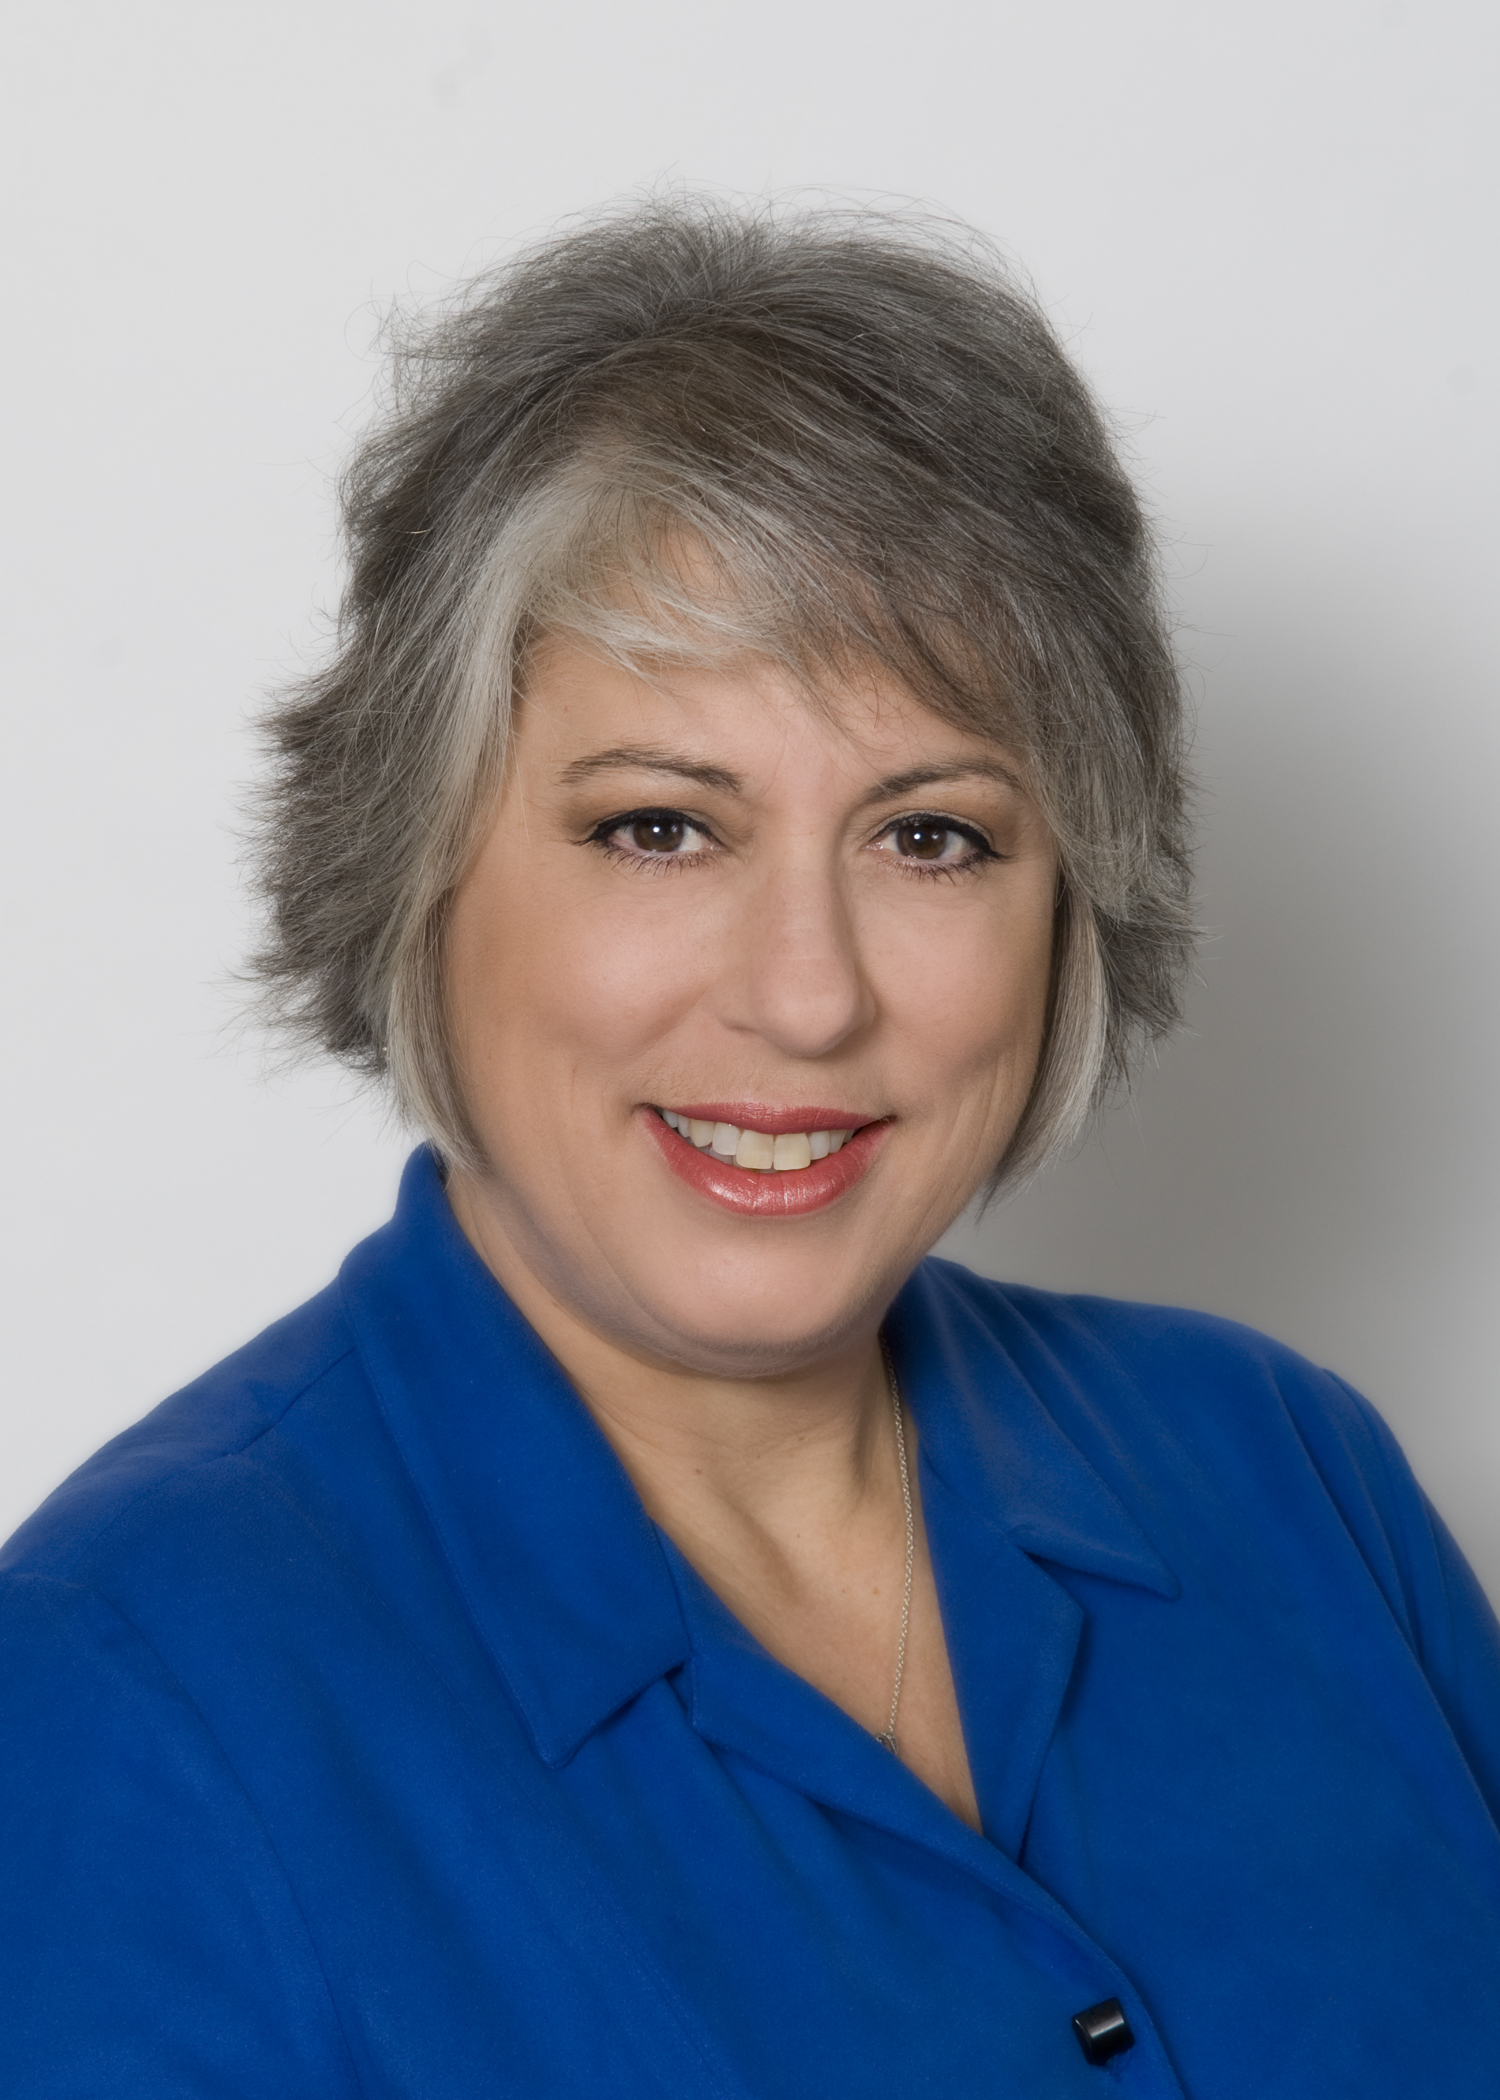 Sharon McLeese